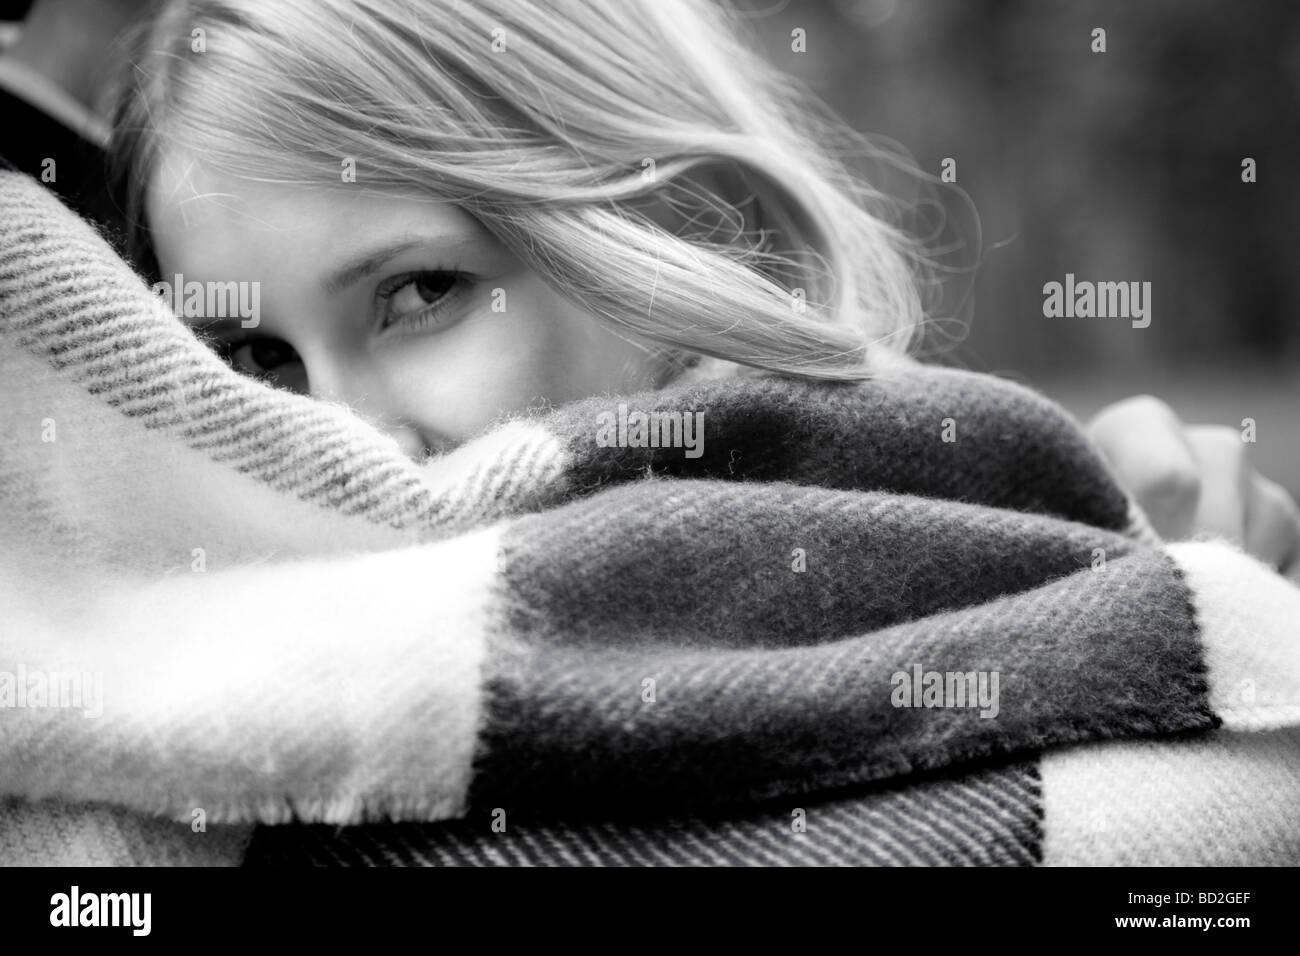 Couple blanket Photo Stock